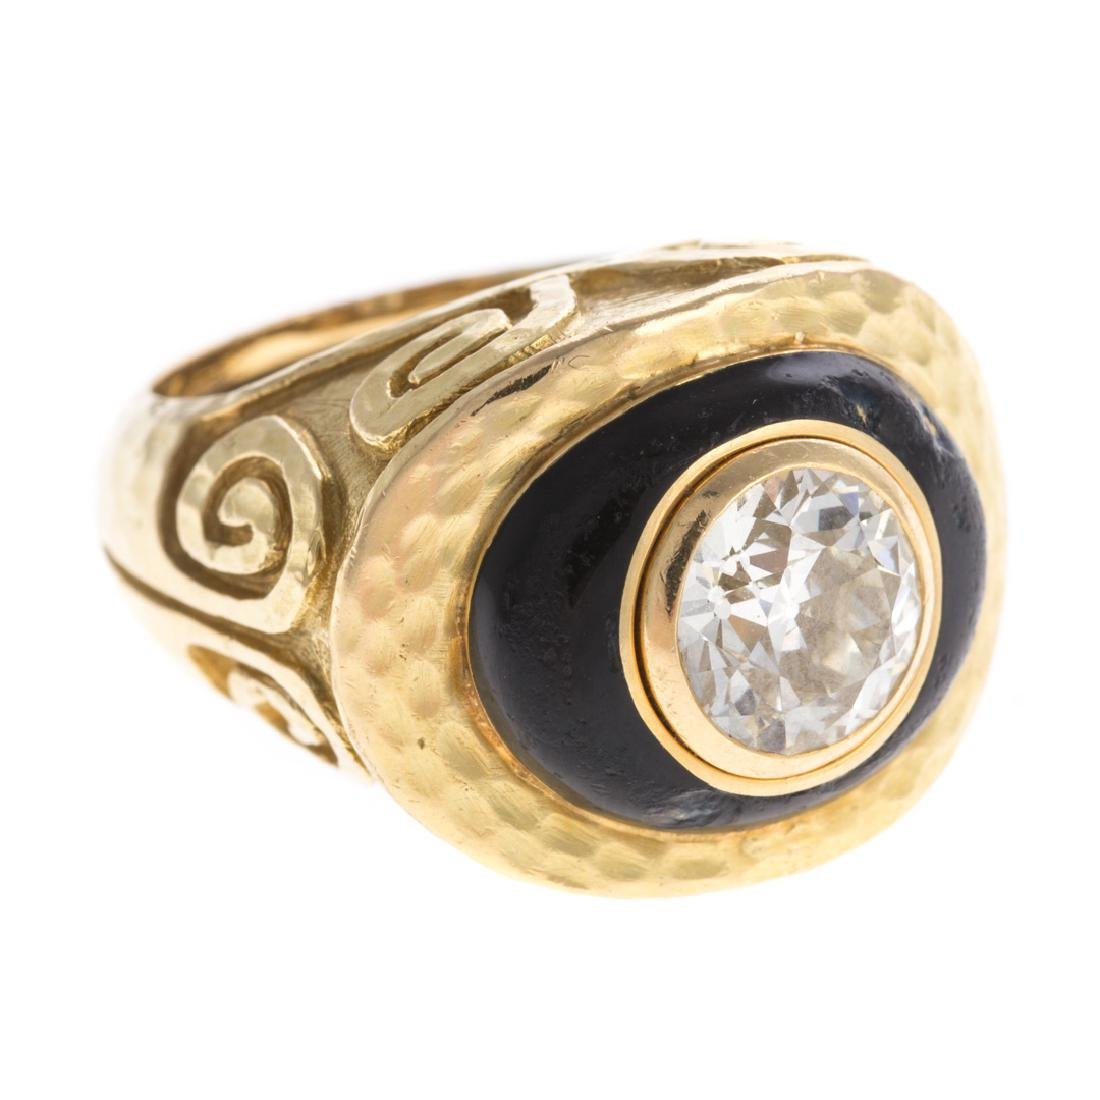 A 18K Diamond Ring & Enamel by David Webb - 2